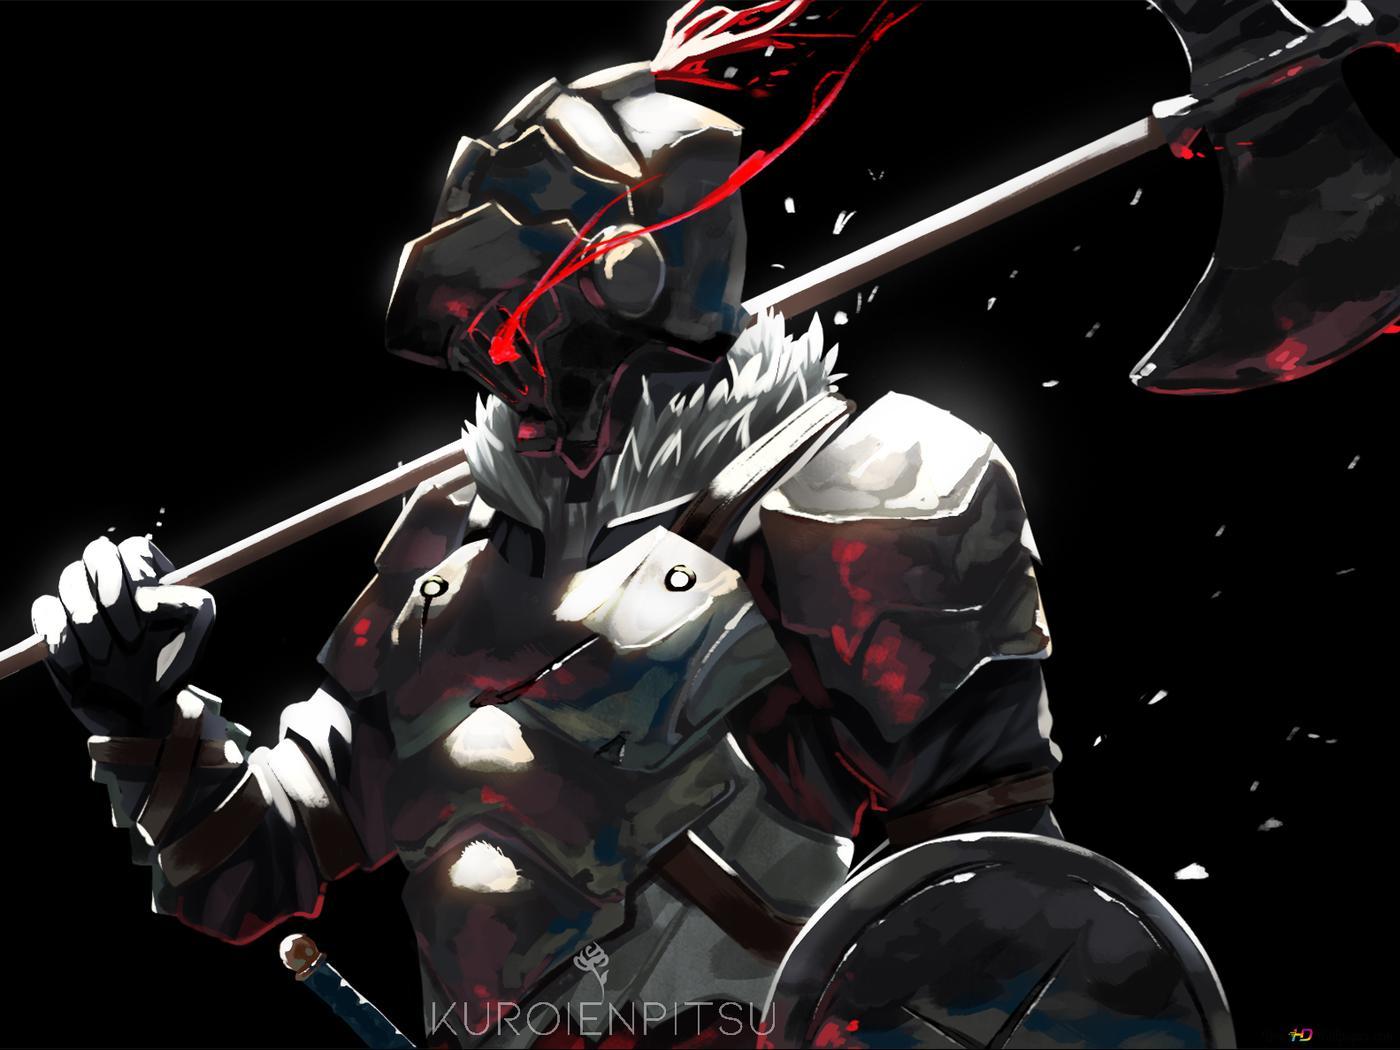 Zed Galaxy Slayer Wallpaper Hd 4k: Goblin Slayer HD Wallpaper Download